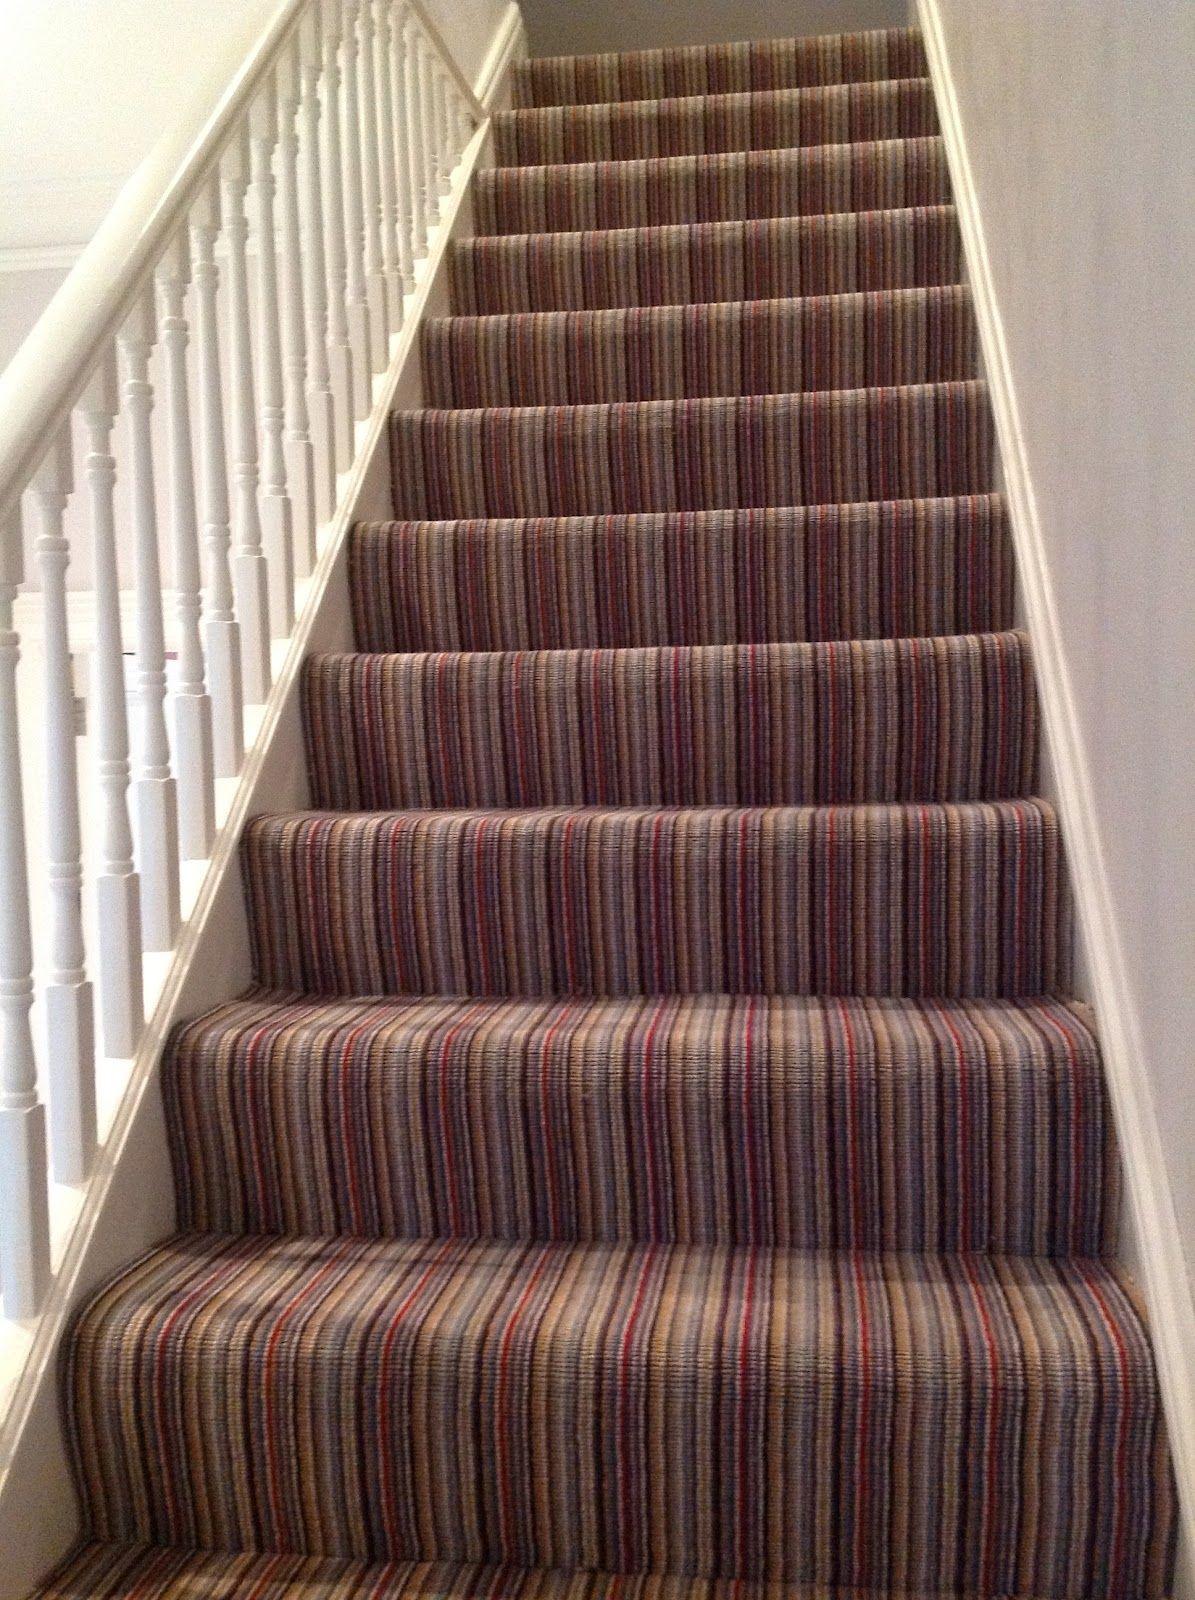 Striped Stair Carpet Stairway Carpet Stairways Stairs